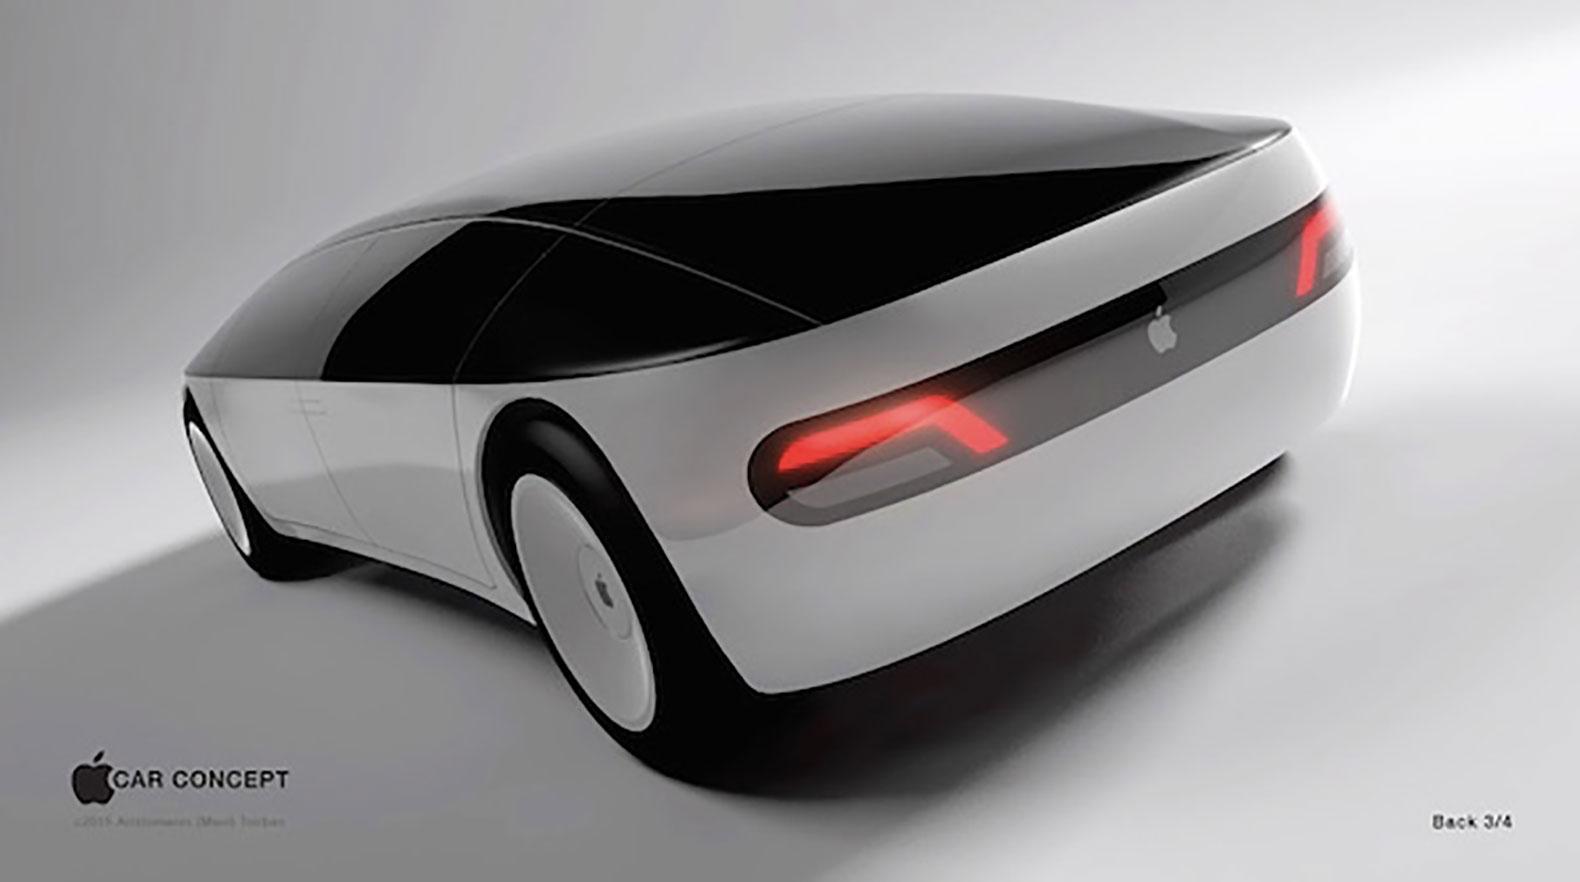 apple-car-electric-car-autonomous-car-apple-car-release-date-confirmed